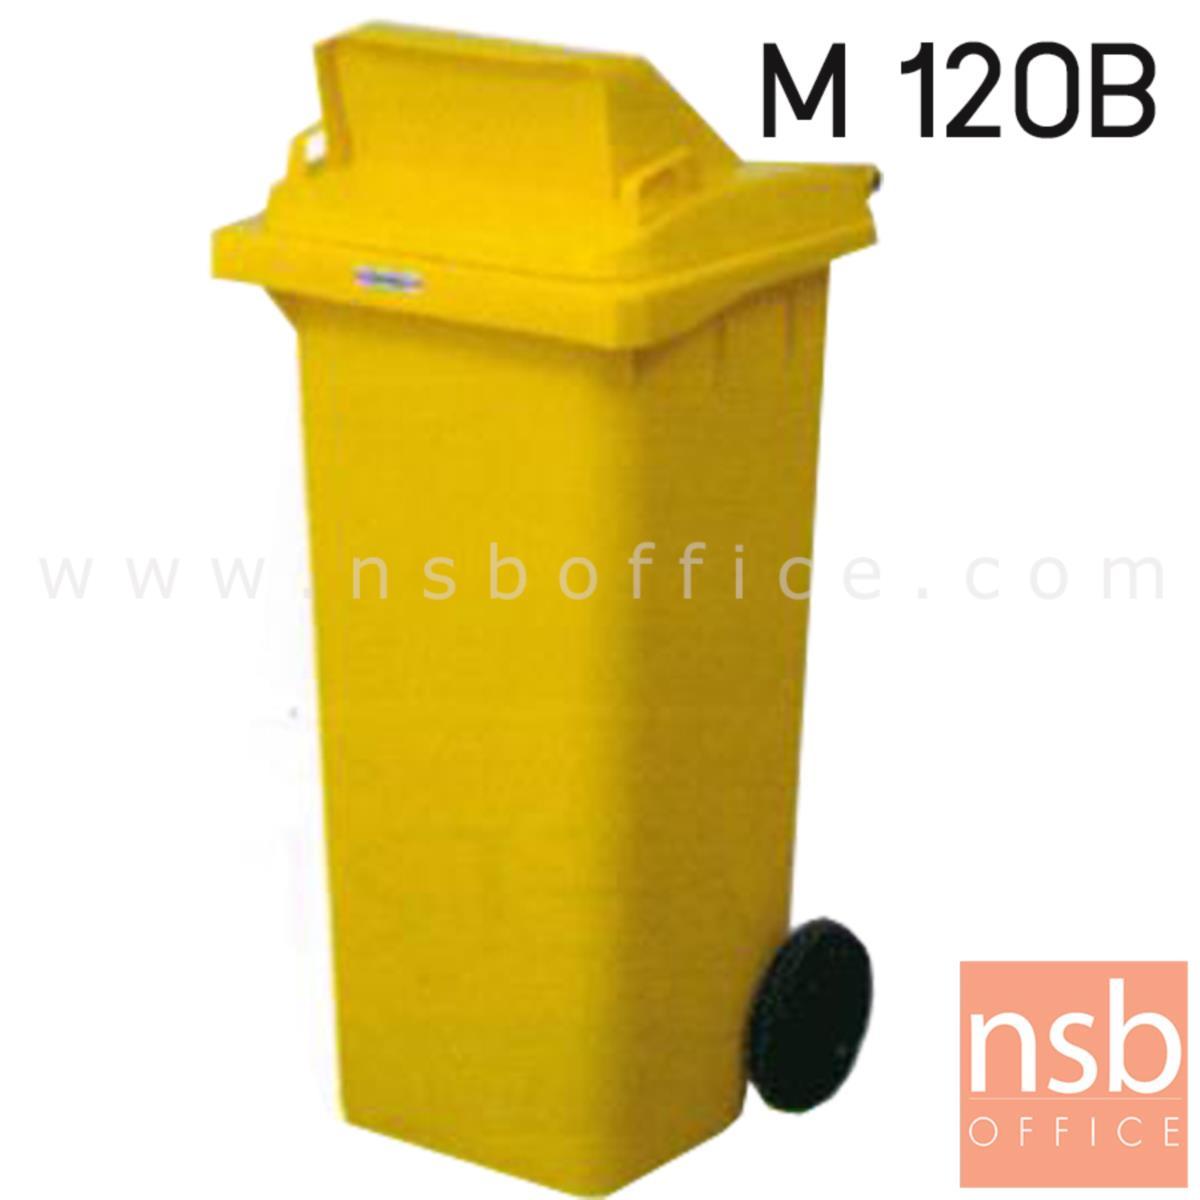 G09A012:ถังขยะ มีช่องเล็กเปิดปิดอัตโนมัติที่ฝา จุ 120 ลิตร